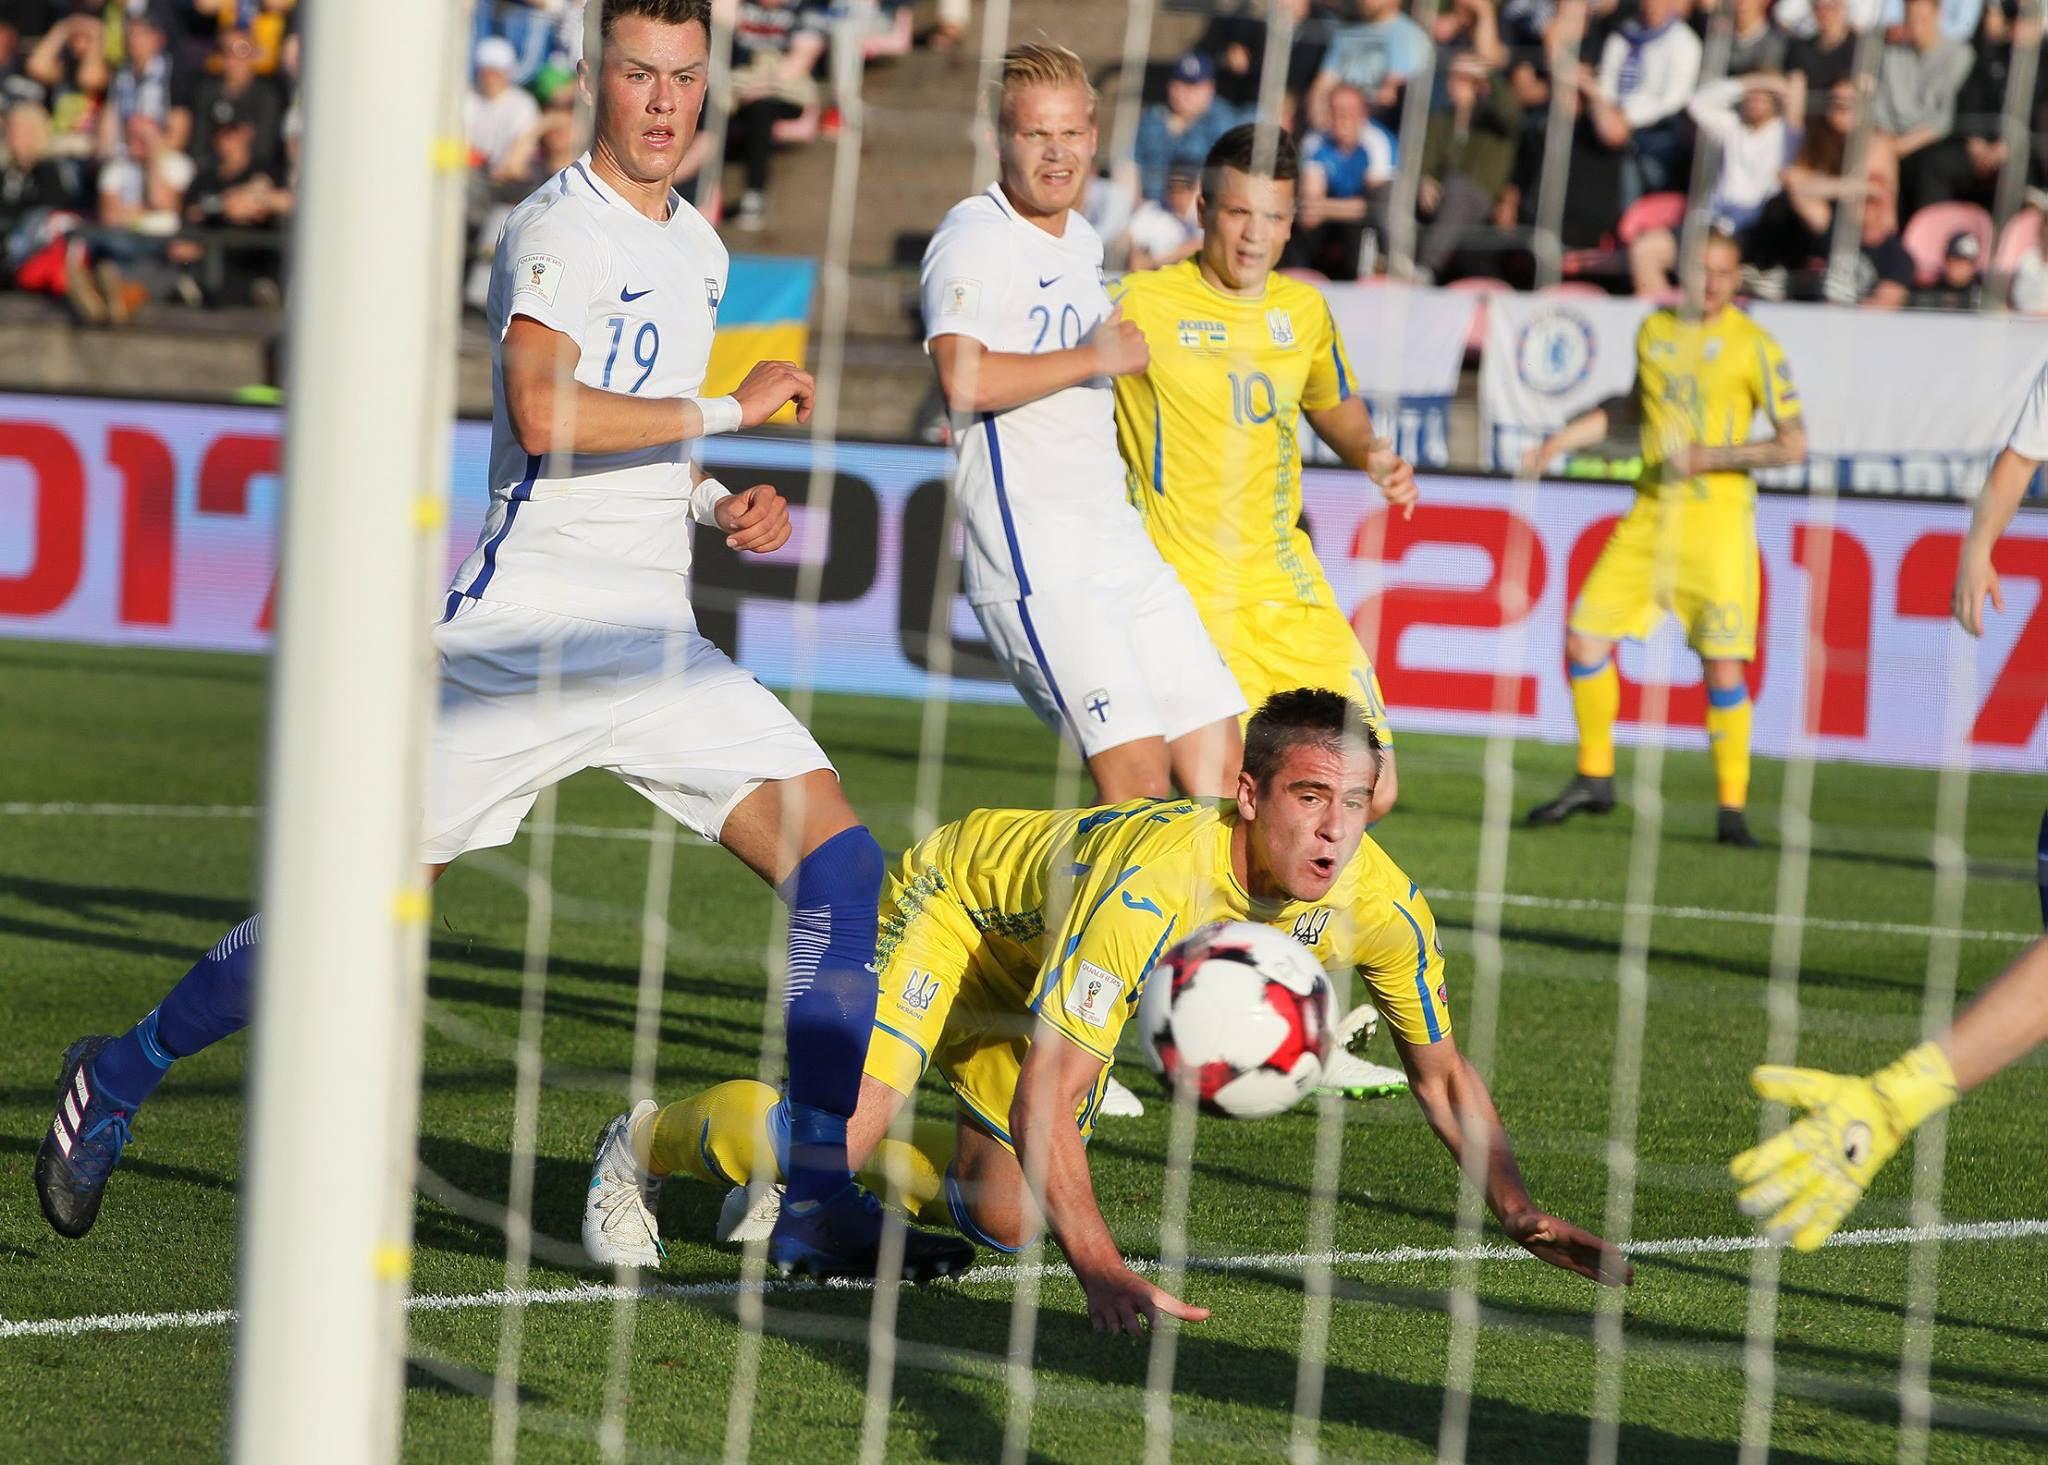 Бавария — Байер: прогноз на матч 18.08.2017